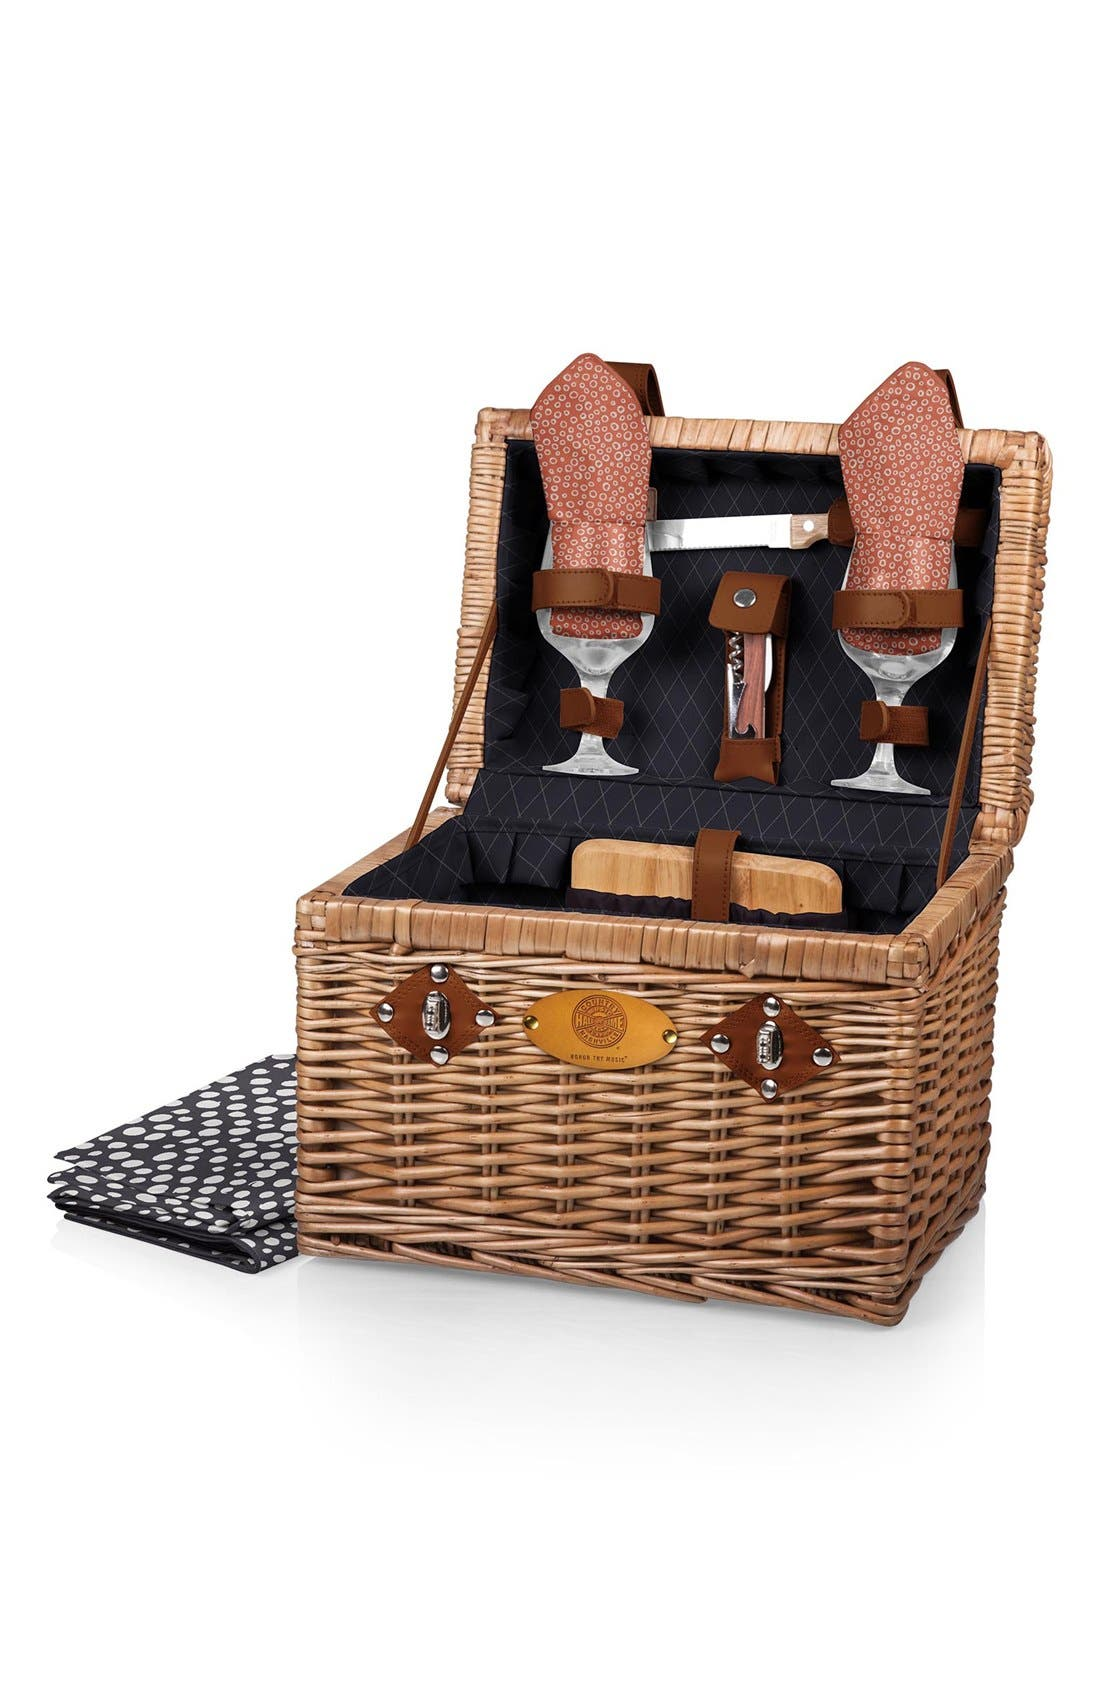 Main Image - Picnic Time 'Napa' Wicker Picnic Basket